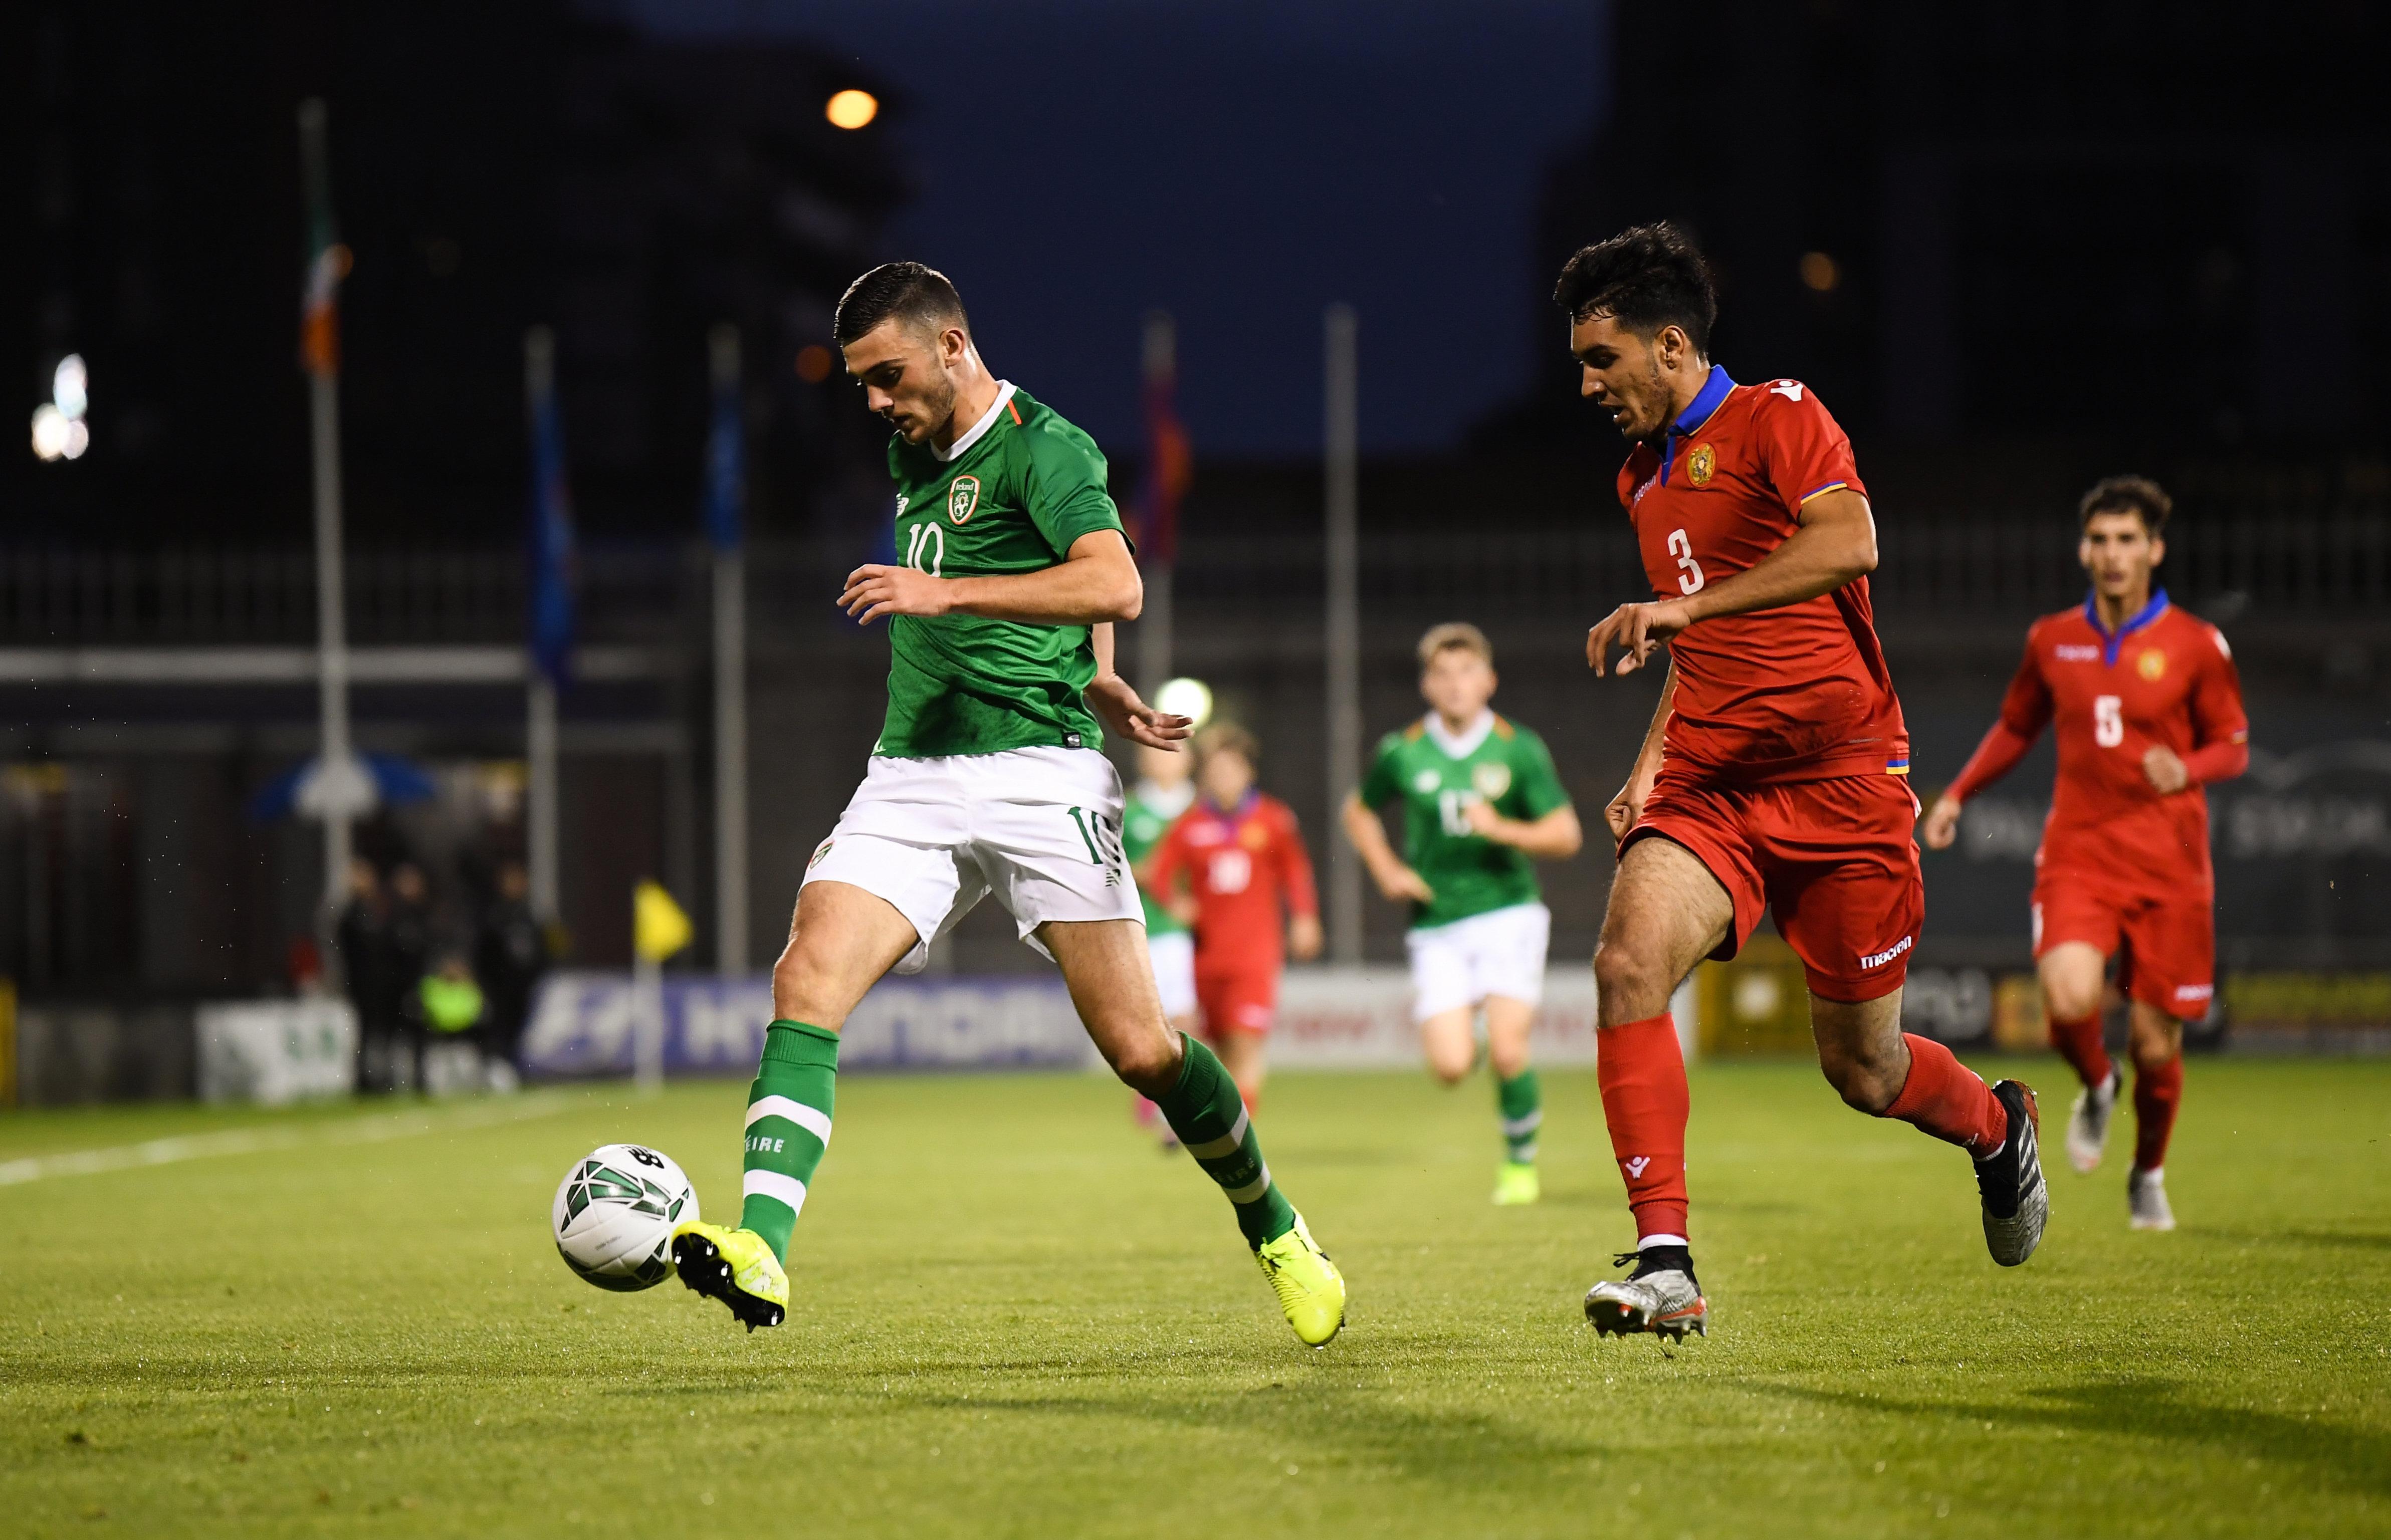 Republic of Ireland v Armenia - UEFA European U21 Championship Qualifier Group 1